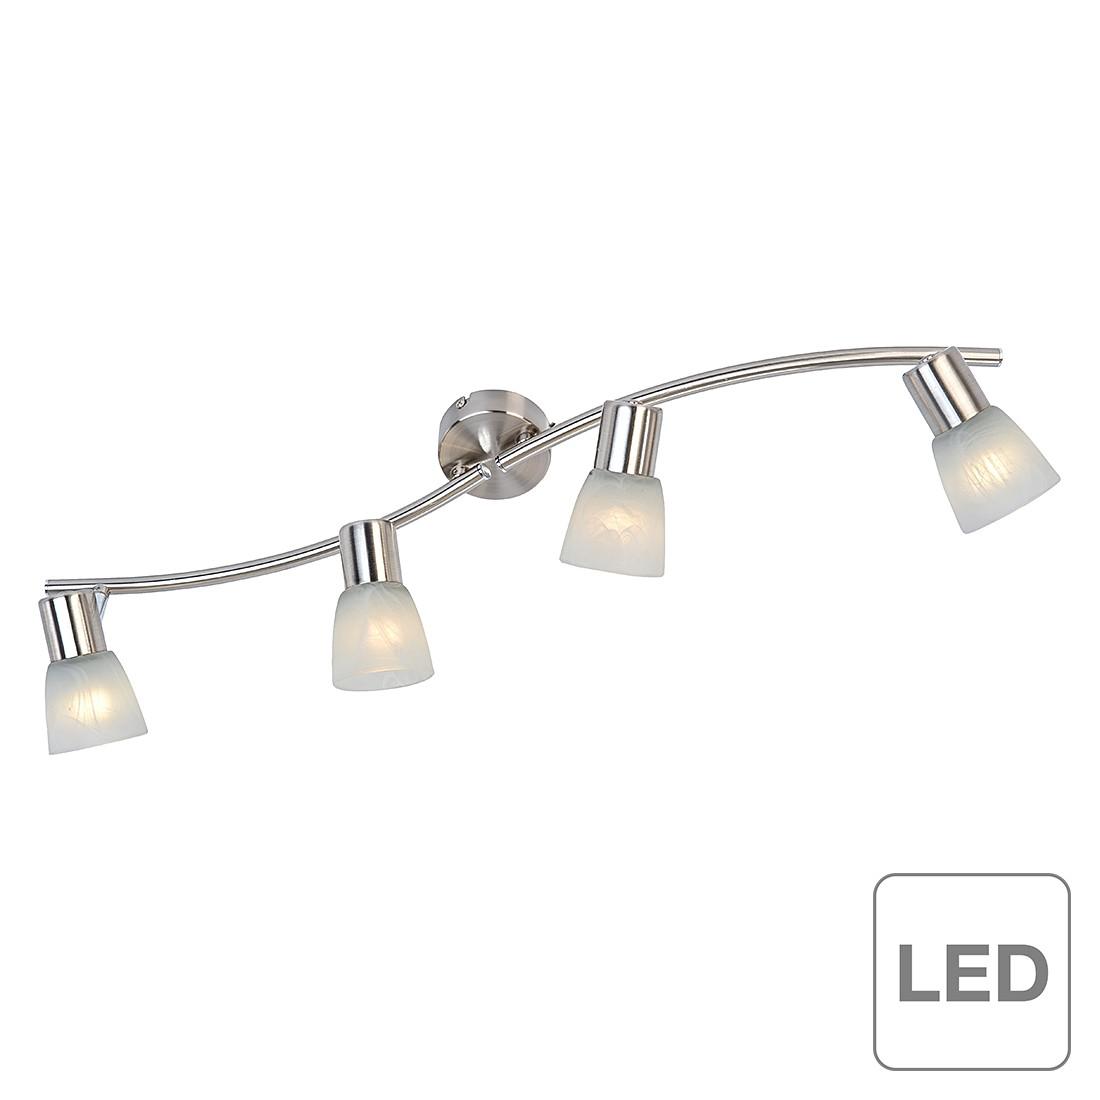 LED-Balken Ancona - 4-flammig, Nino Leuchten